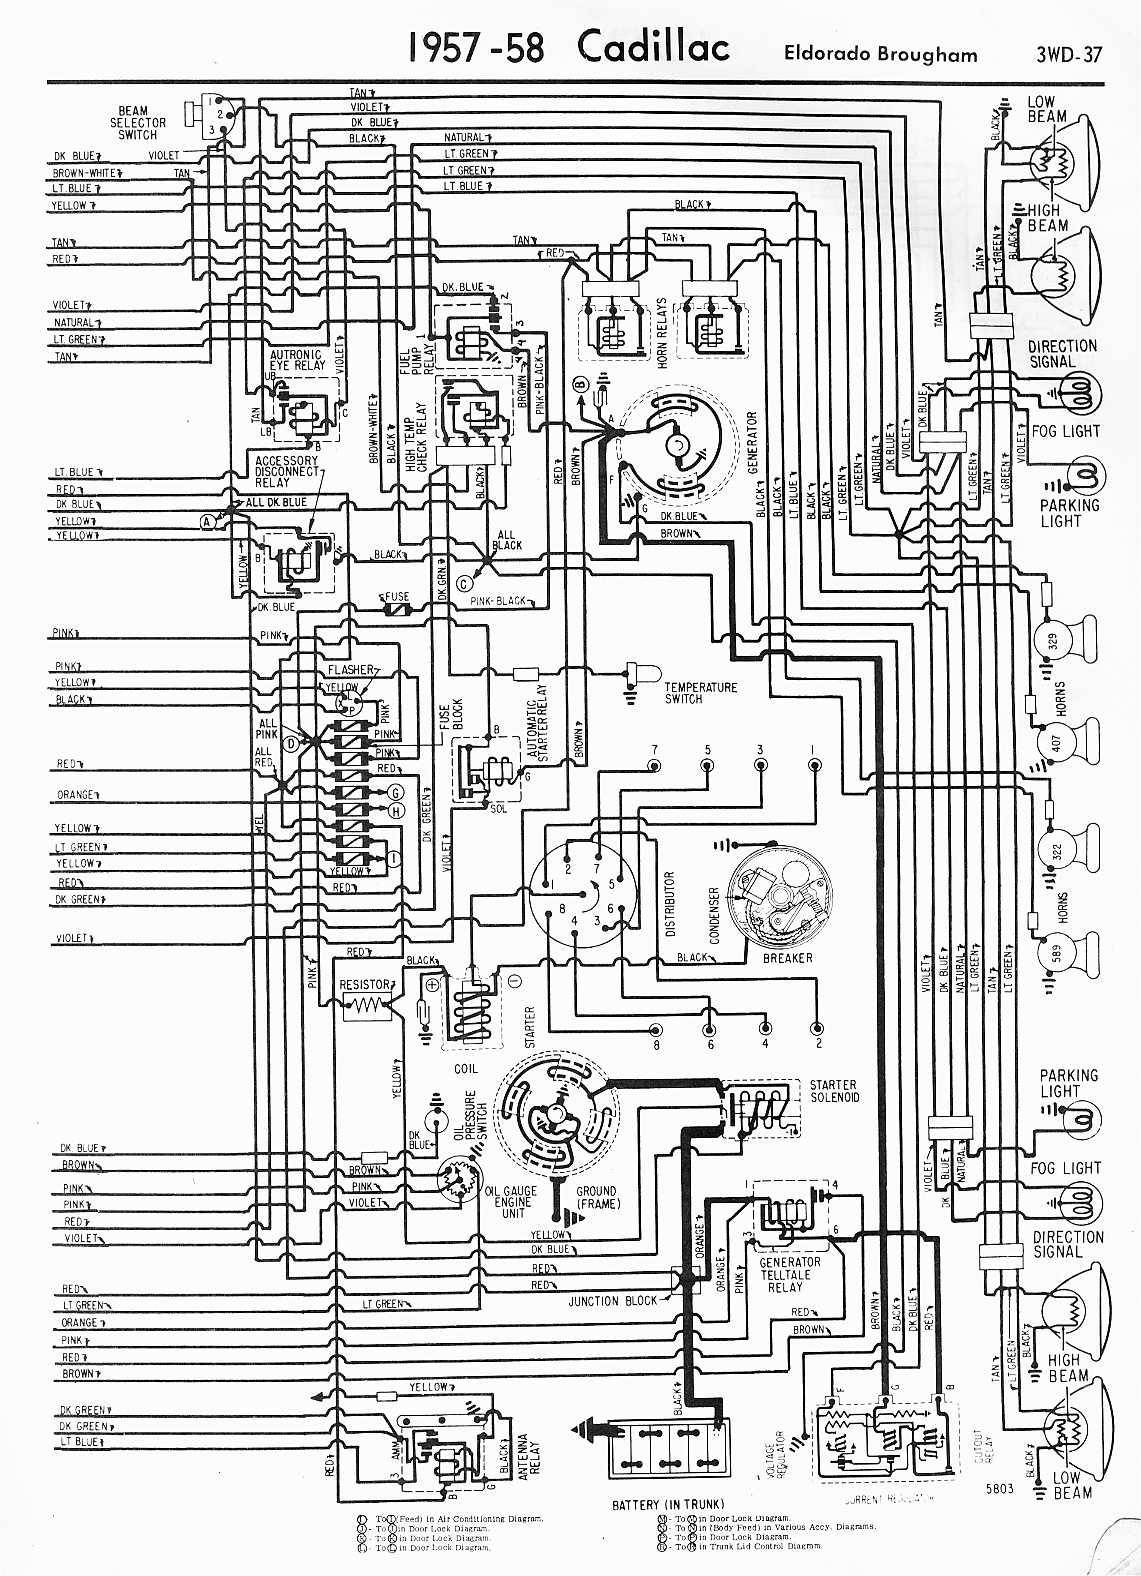 automotive hvac diagram cuisinart dcc 1200 parts cadillac wiring diagrams: 1957-1965